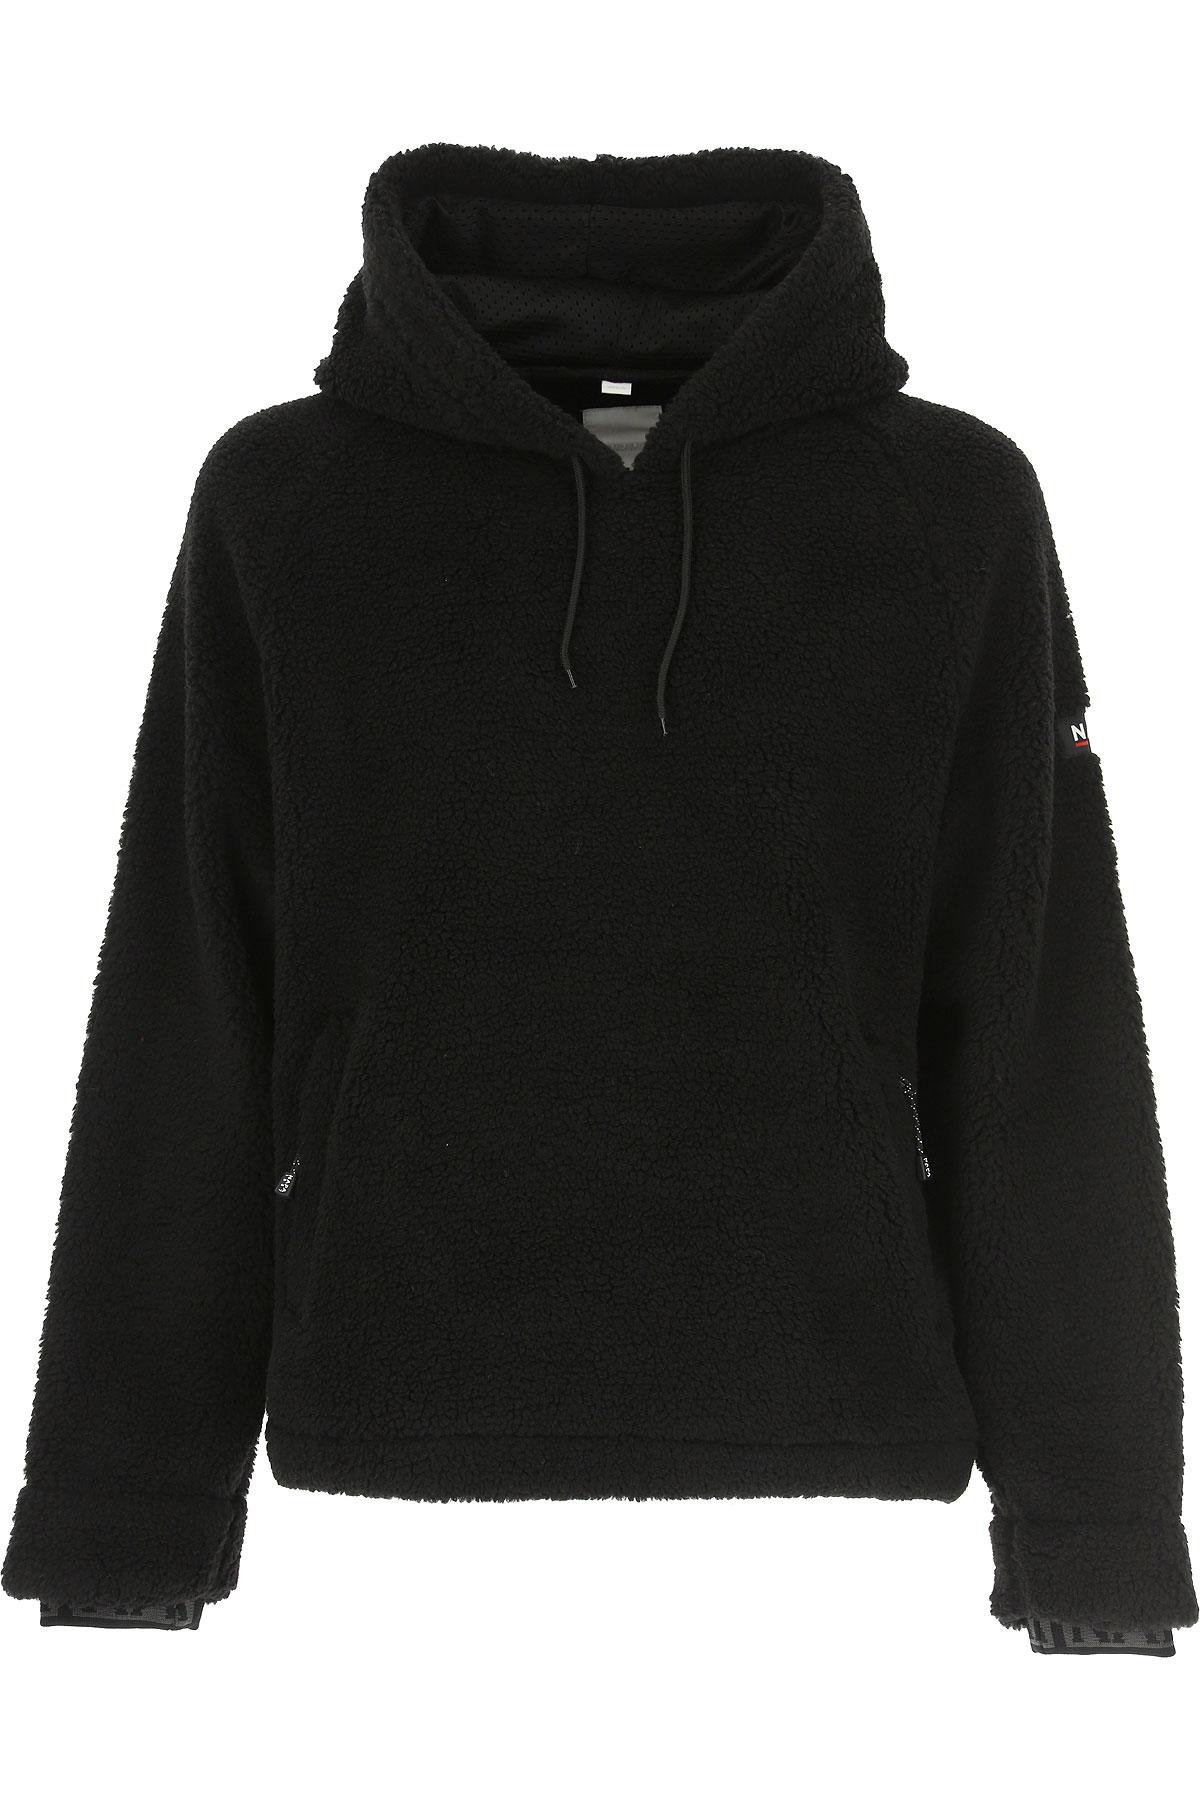 Napapijri Jacket for Men On Sale, Black, polyester, 2019, L M S XL